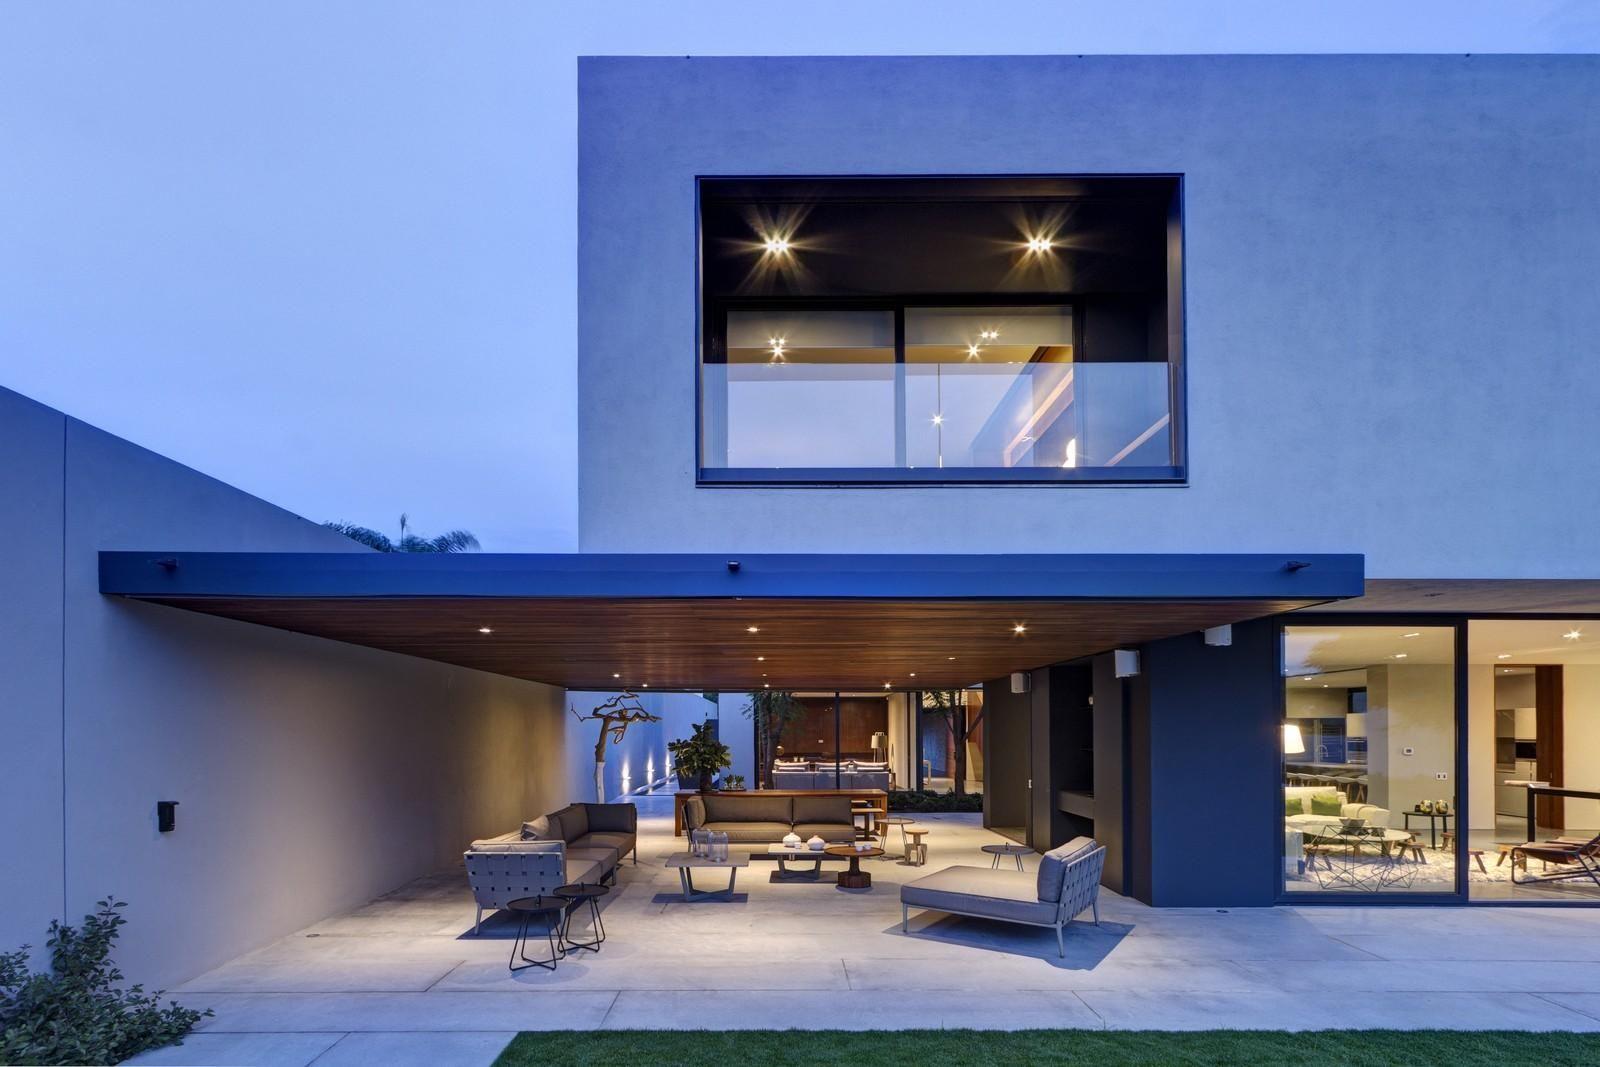 House,casa Orquídea,Andrés Remy,arquitectura,vivienda Ecologica | Casa  Orquidea Del Arq Remy | Pinterest | Houses, House And Html